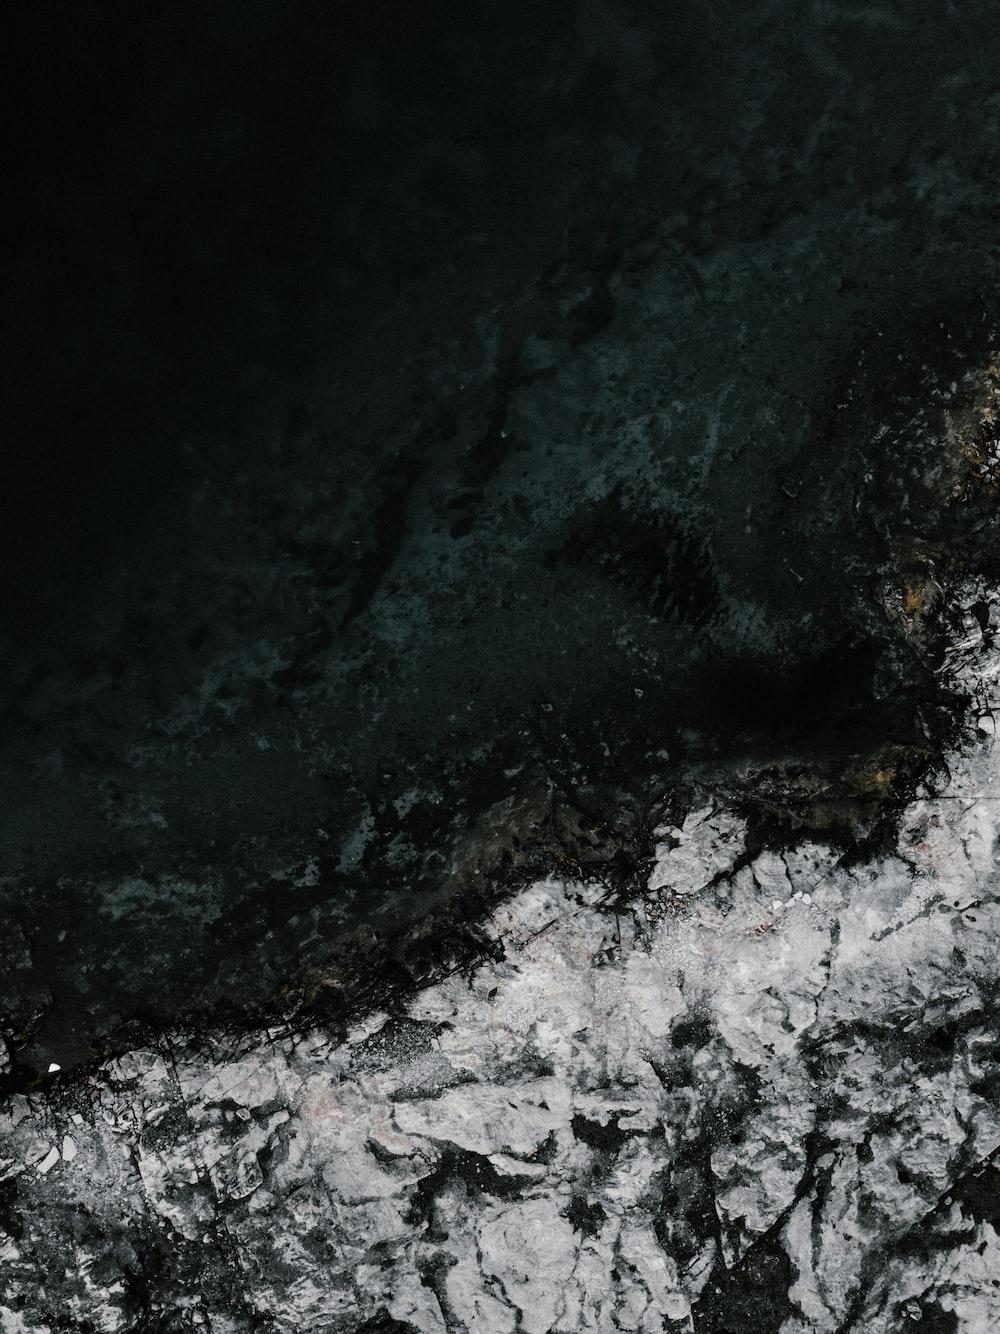 water crashing the cliff during nighttime